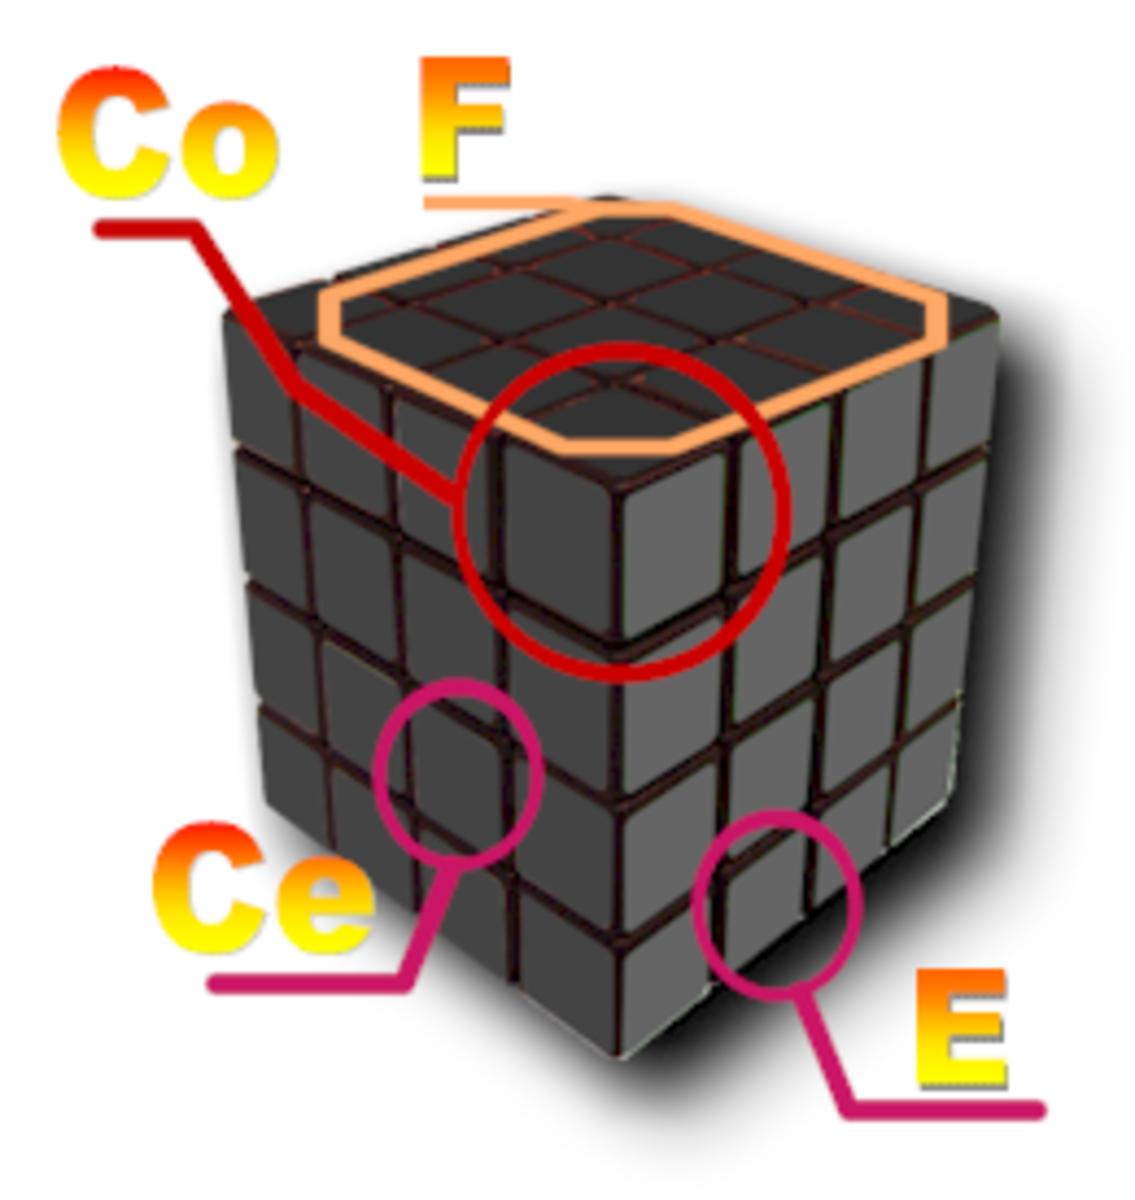 How To Solve A 4x4x4 Rubiks Cube - Rubiks Revenge - 4x4 Rubik's Cube